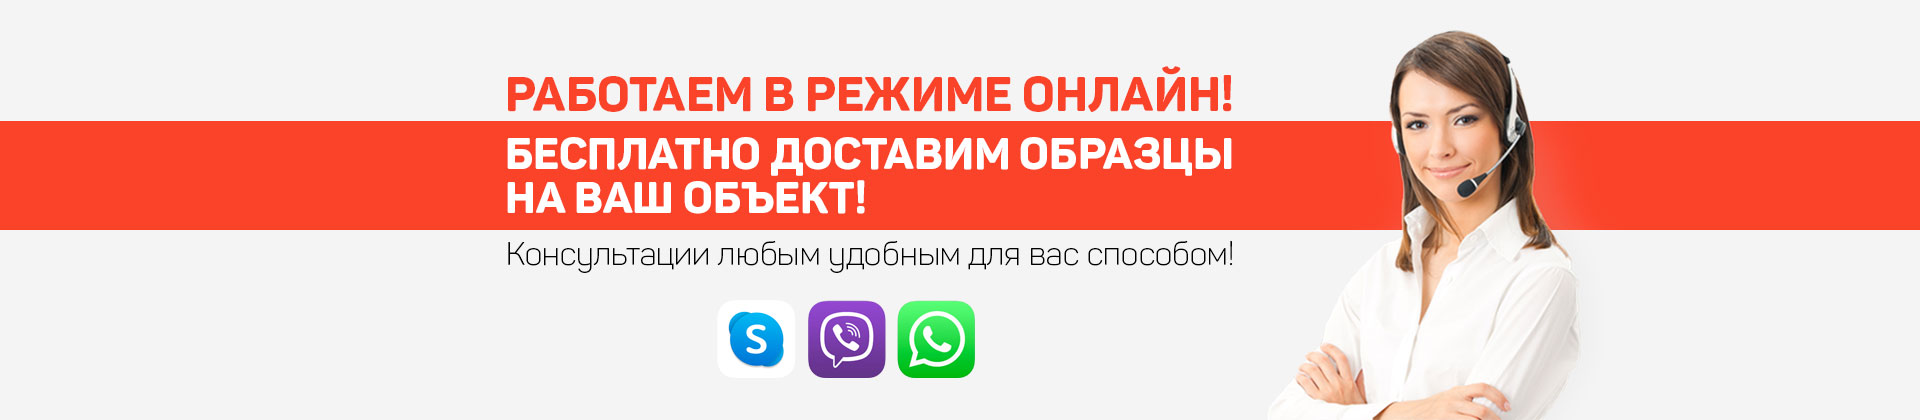 baner-rabotaem-v-online-regime